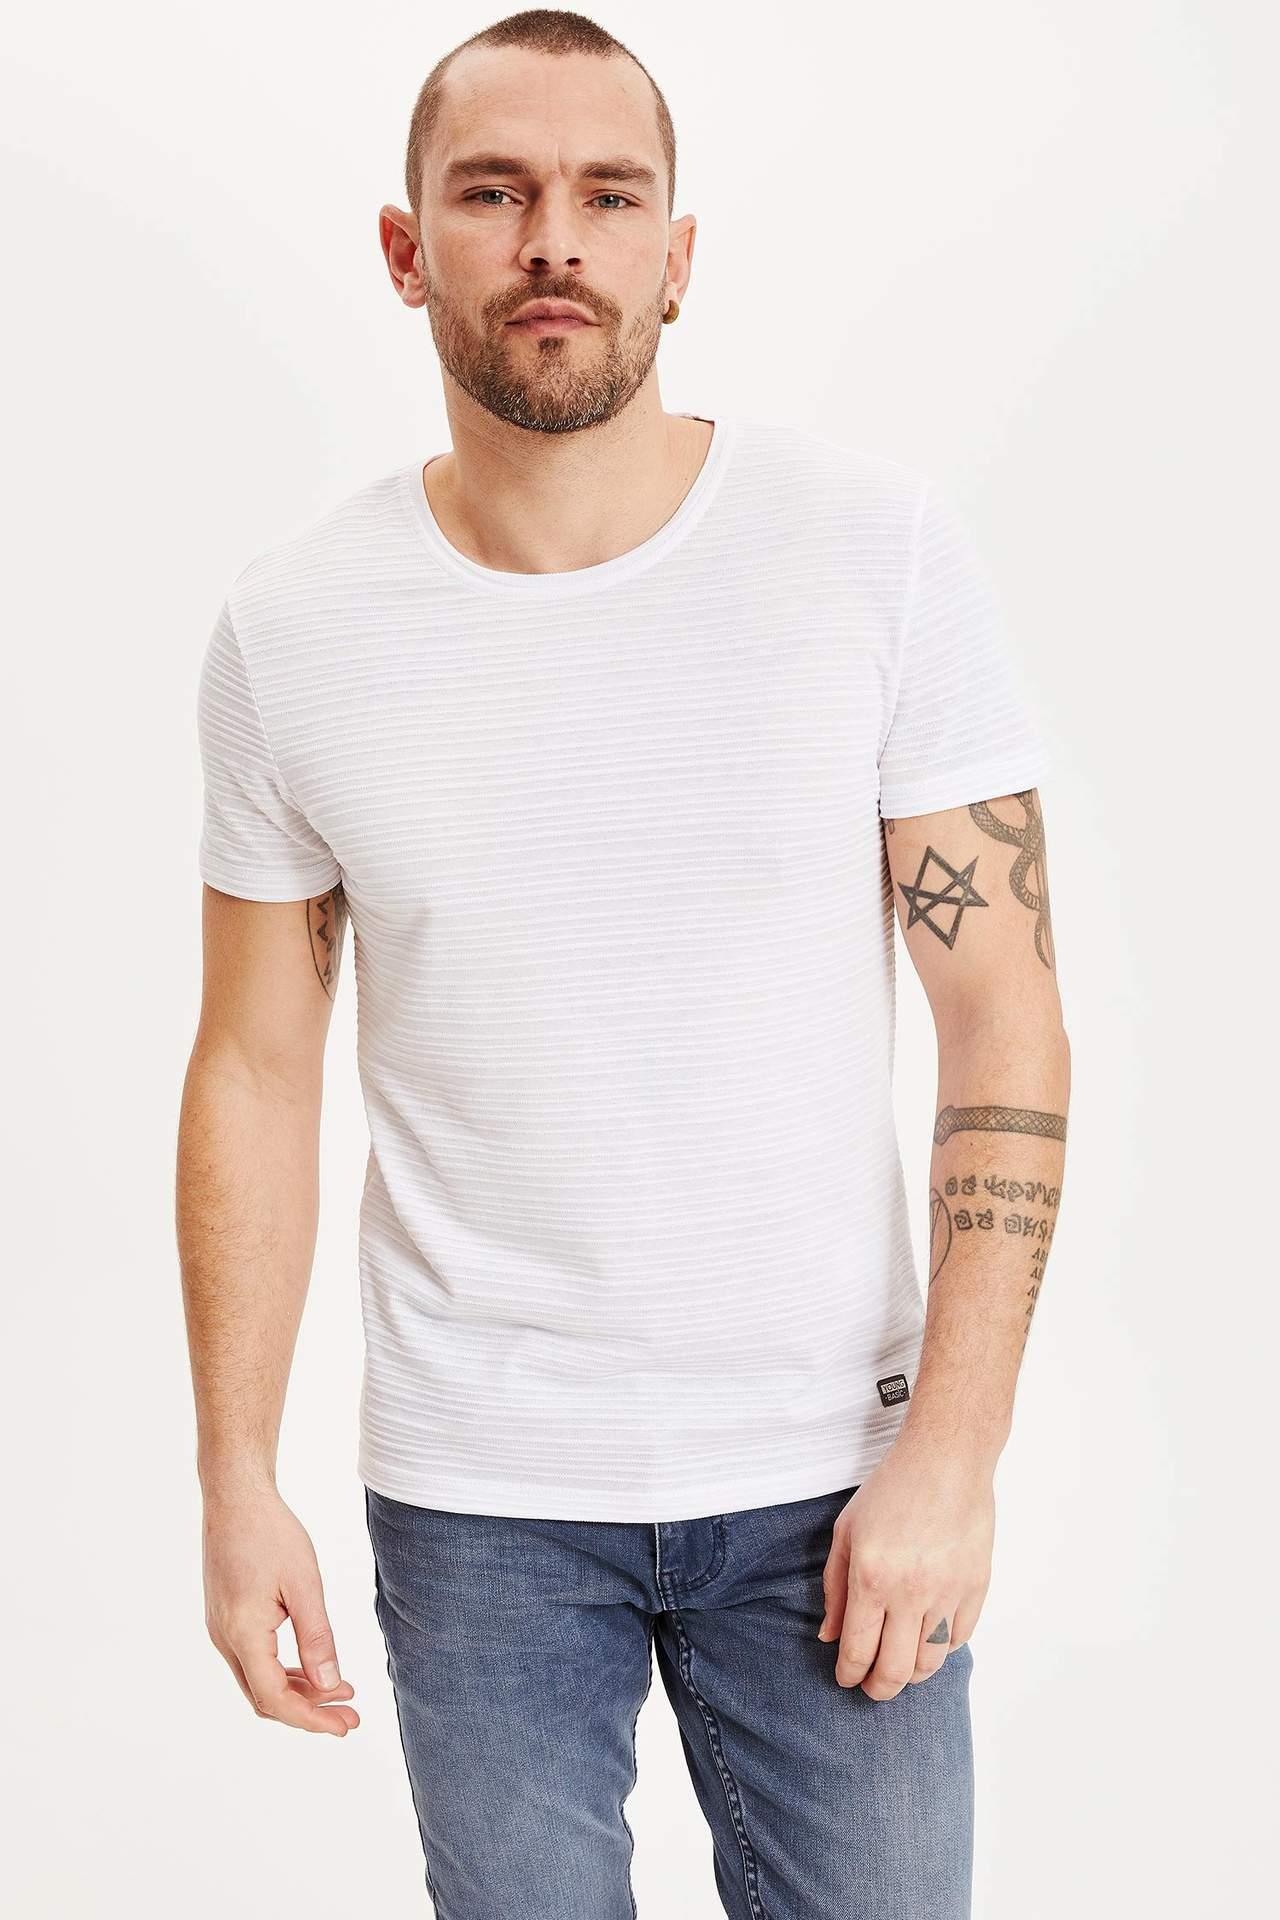 DeFacto Erkek Slim Fit Basic Body Beyaz male